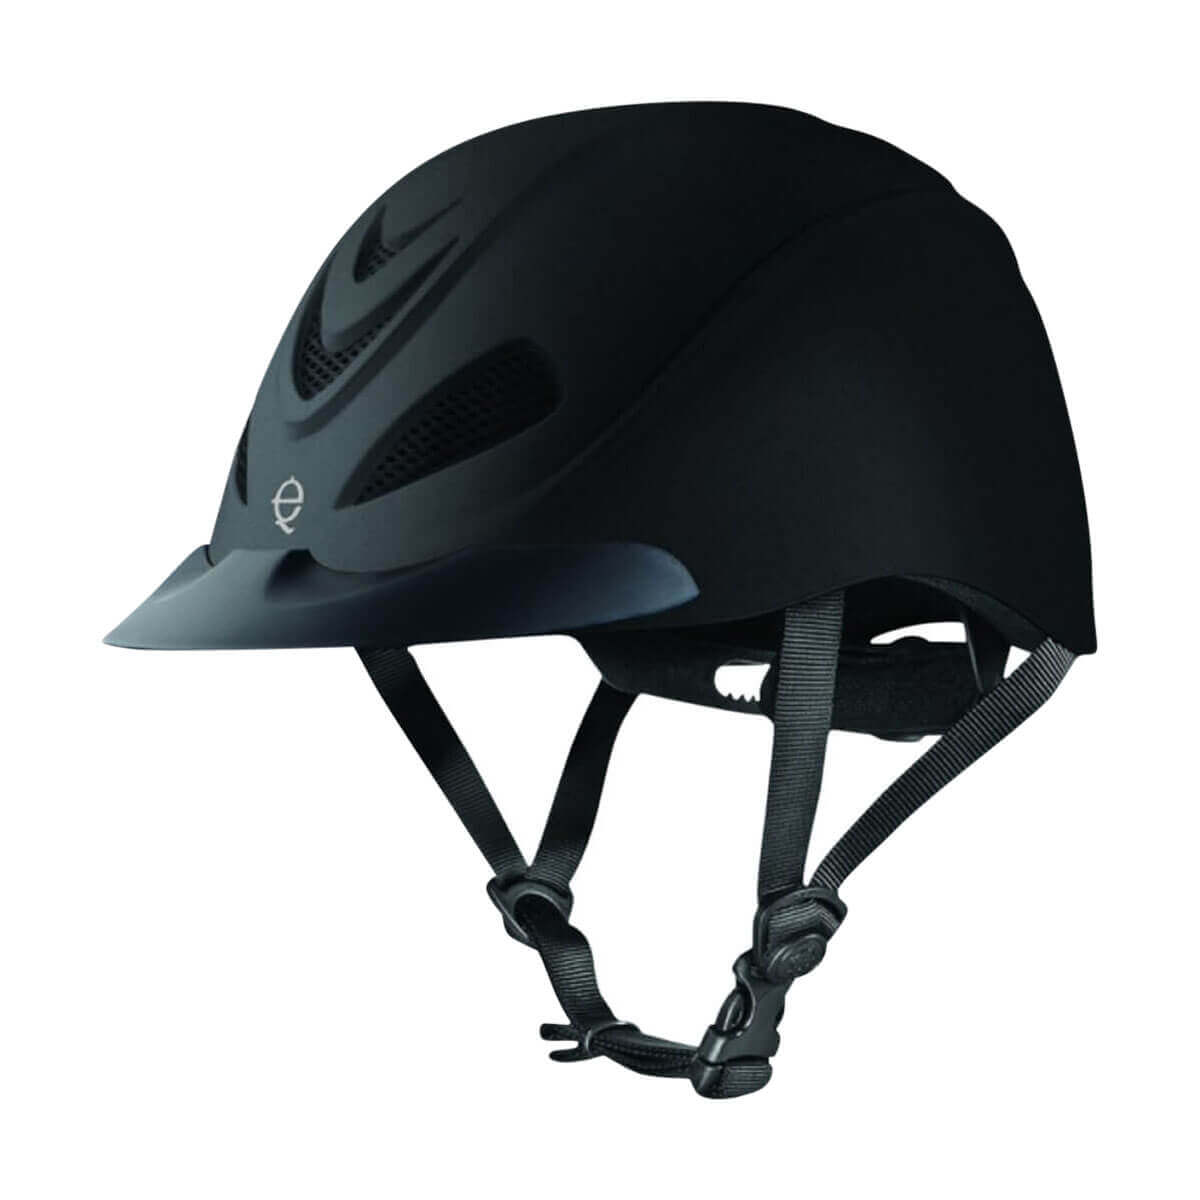 Troxel Liberty Low Profile Schooling Helmet - LARGE